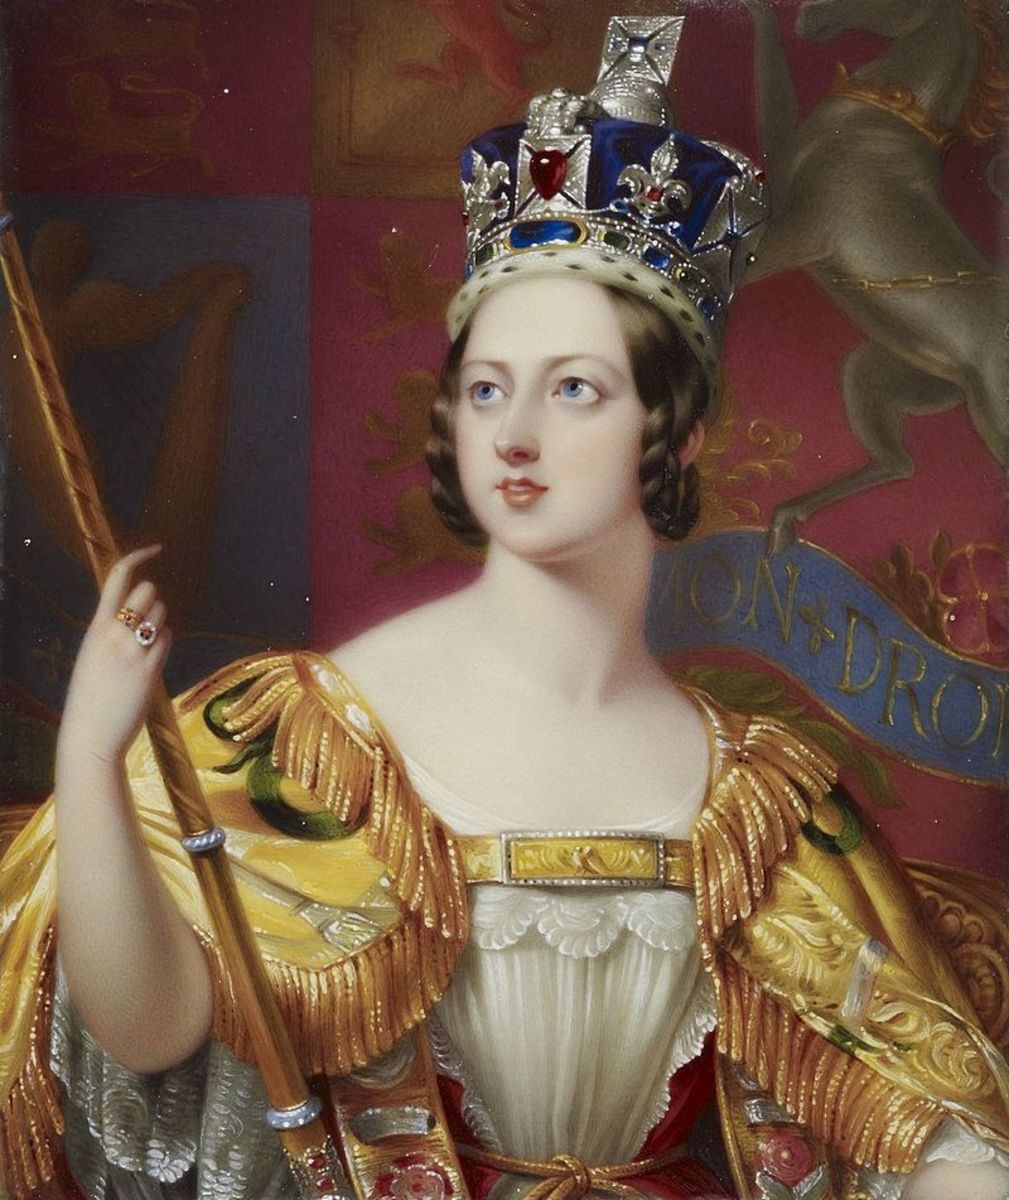 Coronation portrait by George Hayter